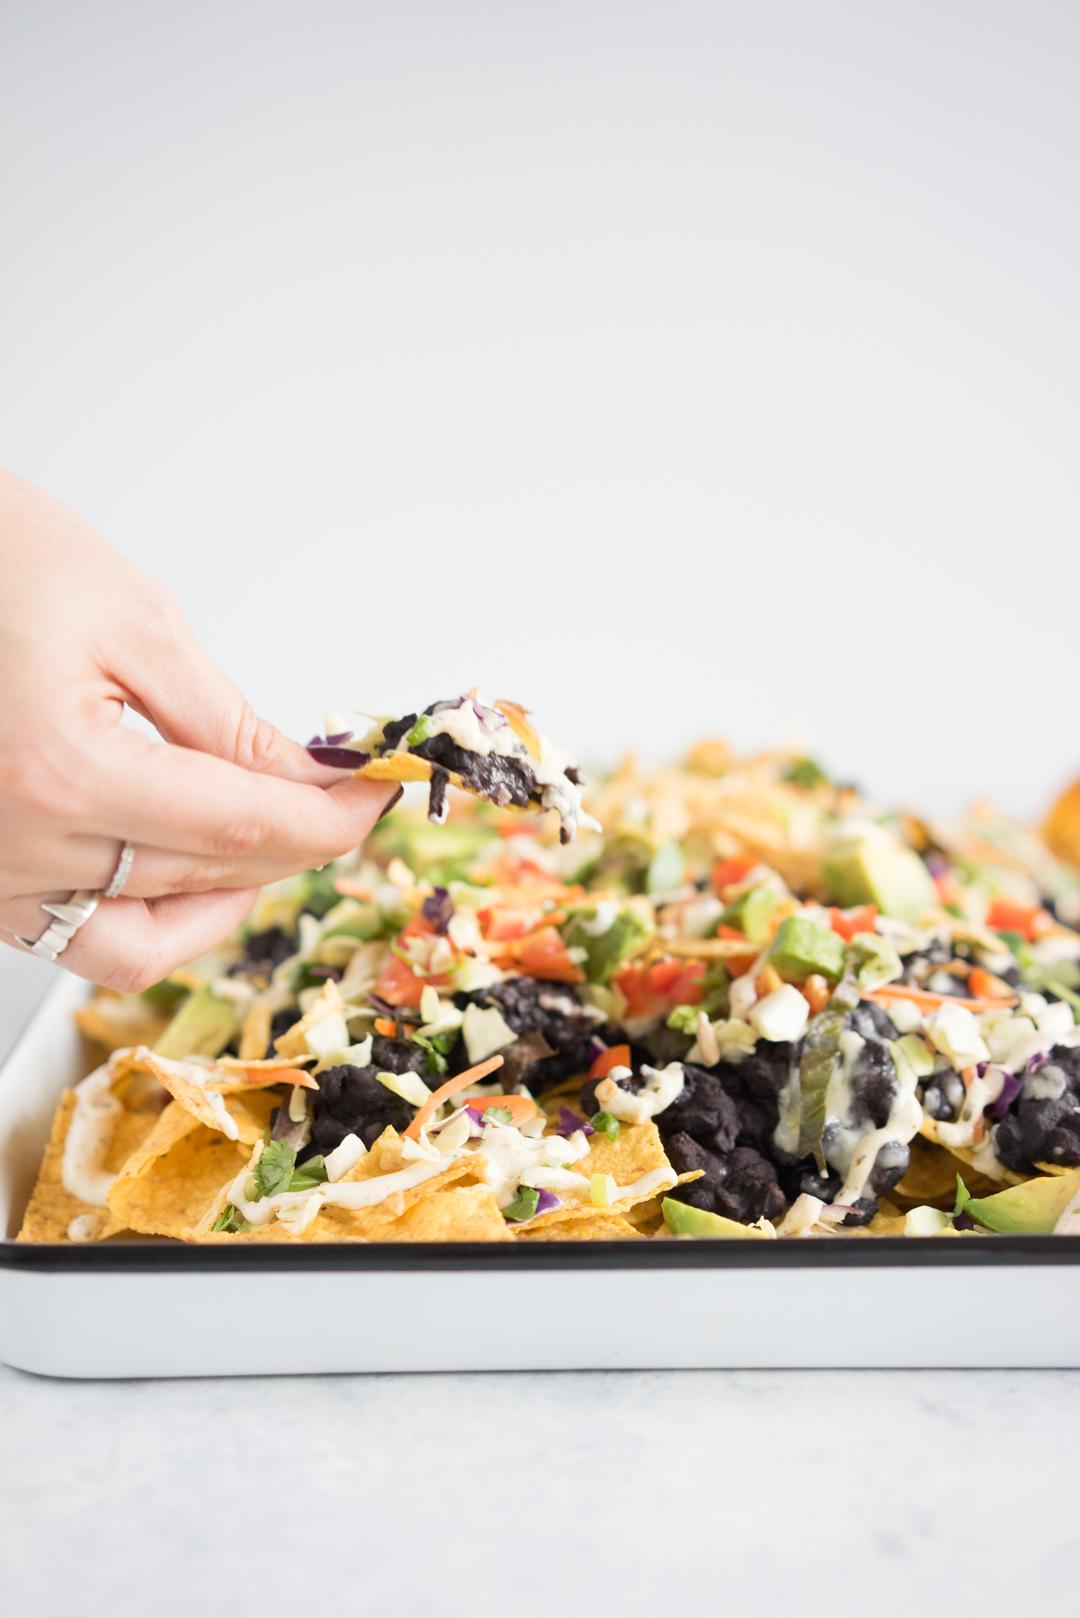 Black bean sheet pan nachos - the perfect simple throw together dinner